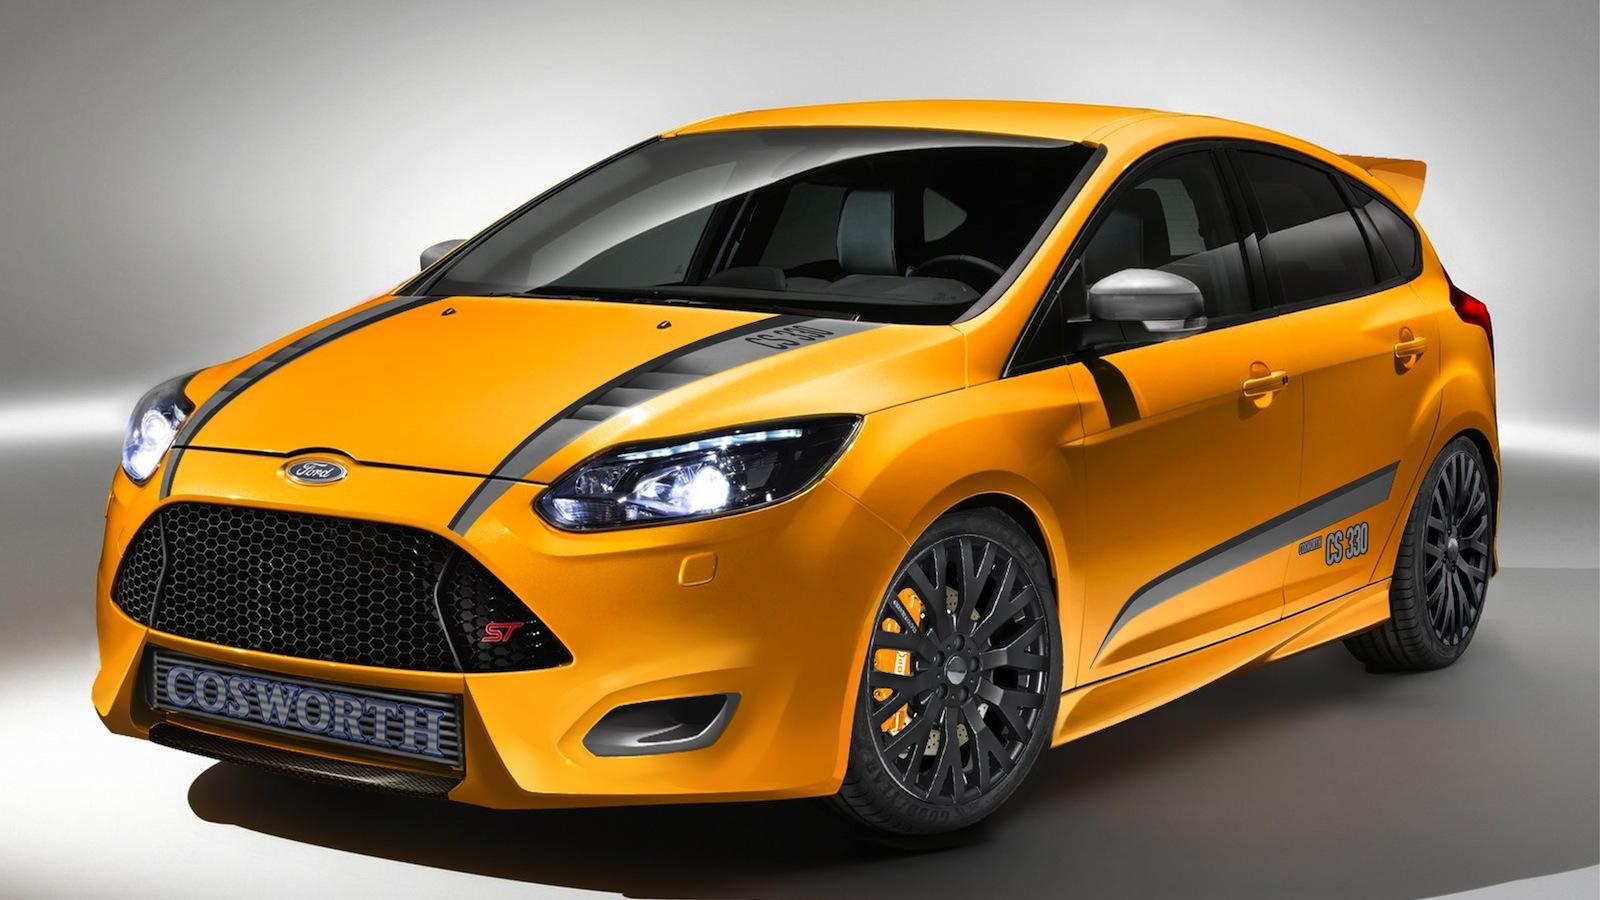 2013 Ford Focus ST built by M&J Enterprises for SEMA 2012